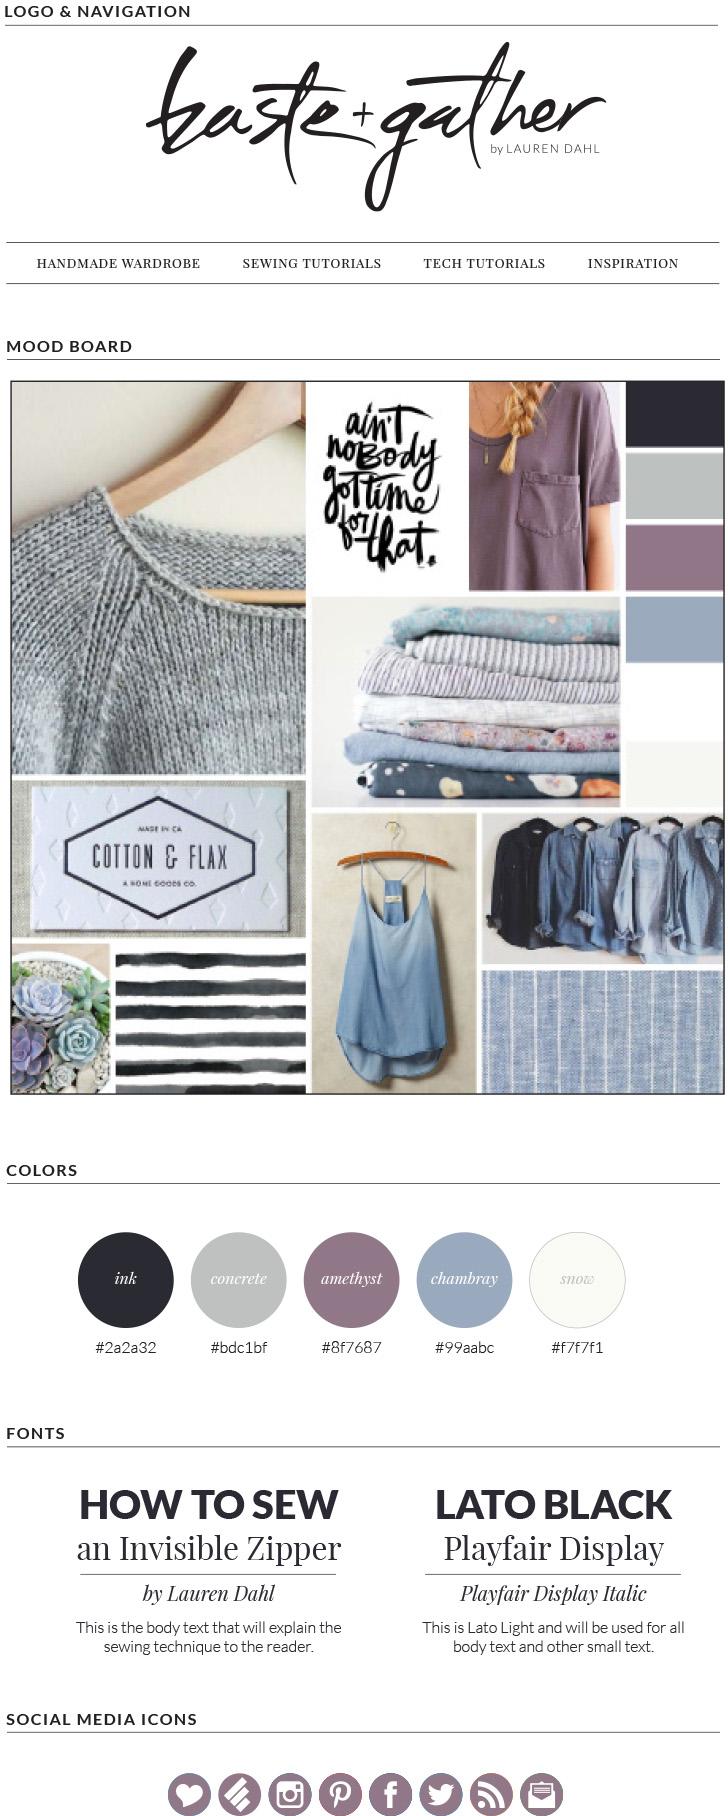 Baste and Gather Blog Mood Board